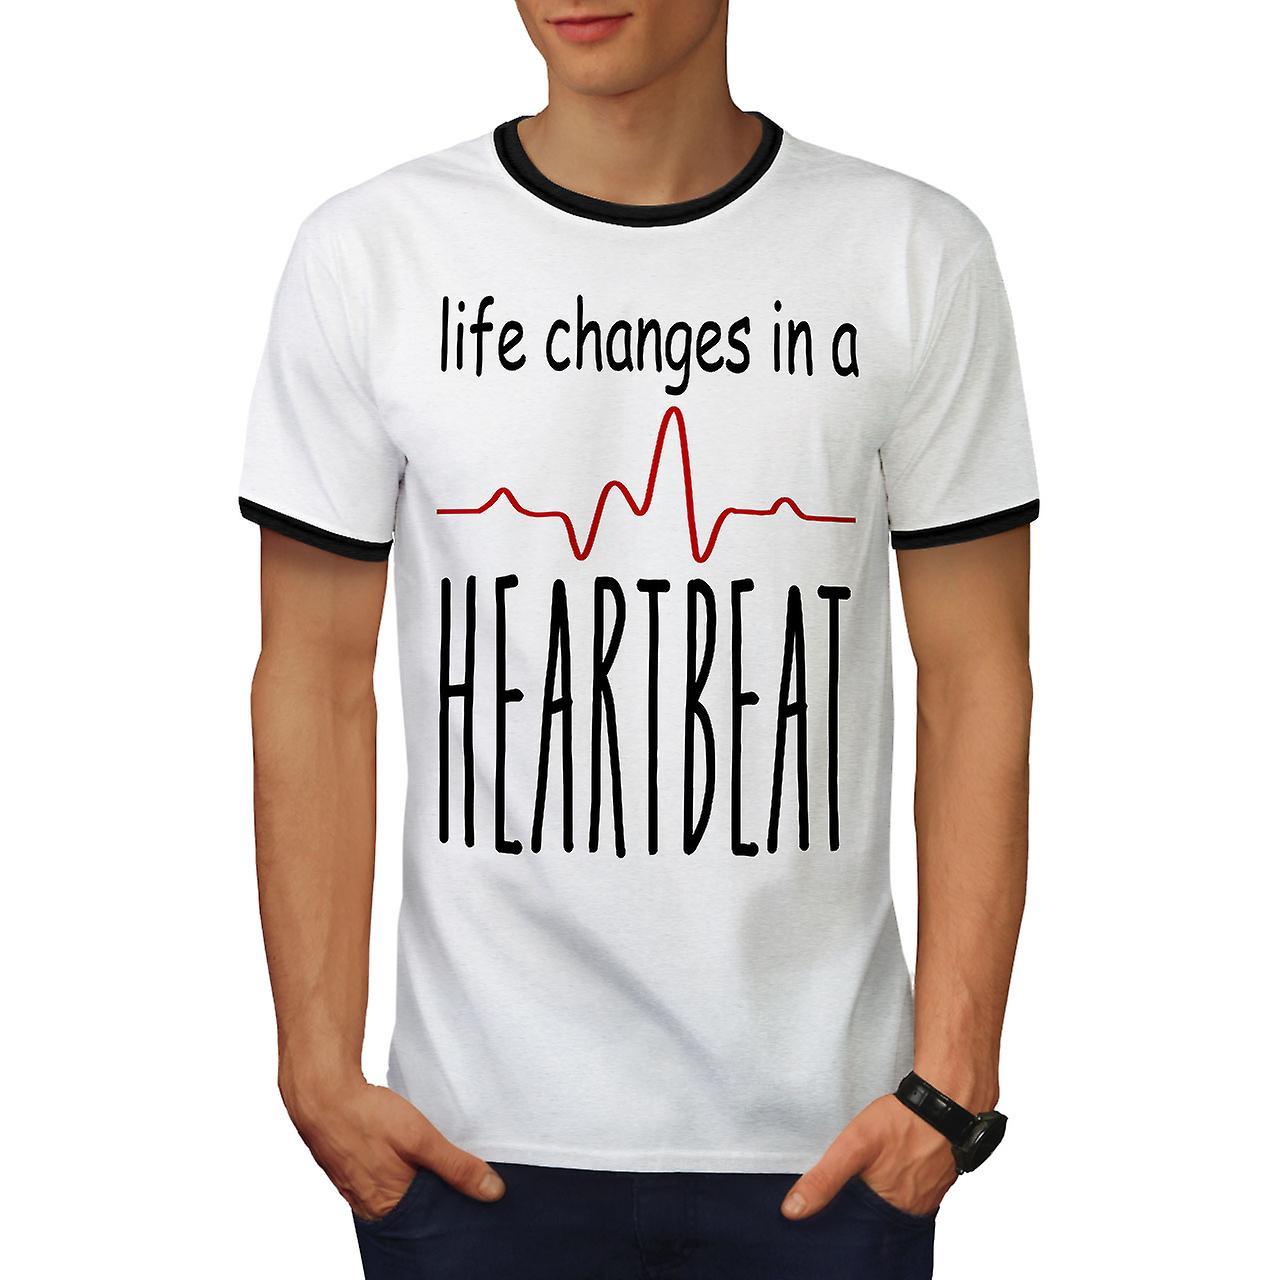 Leben Verandert Schnell Manner Weiss Blackringer T Shirt Wellcoda